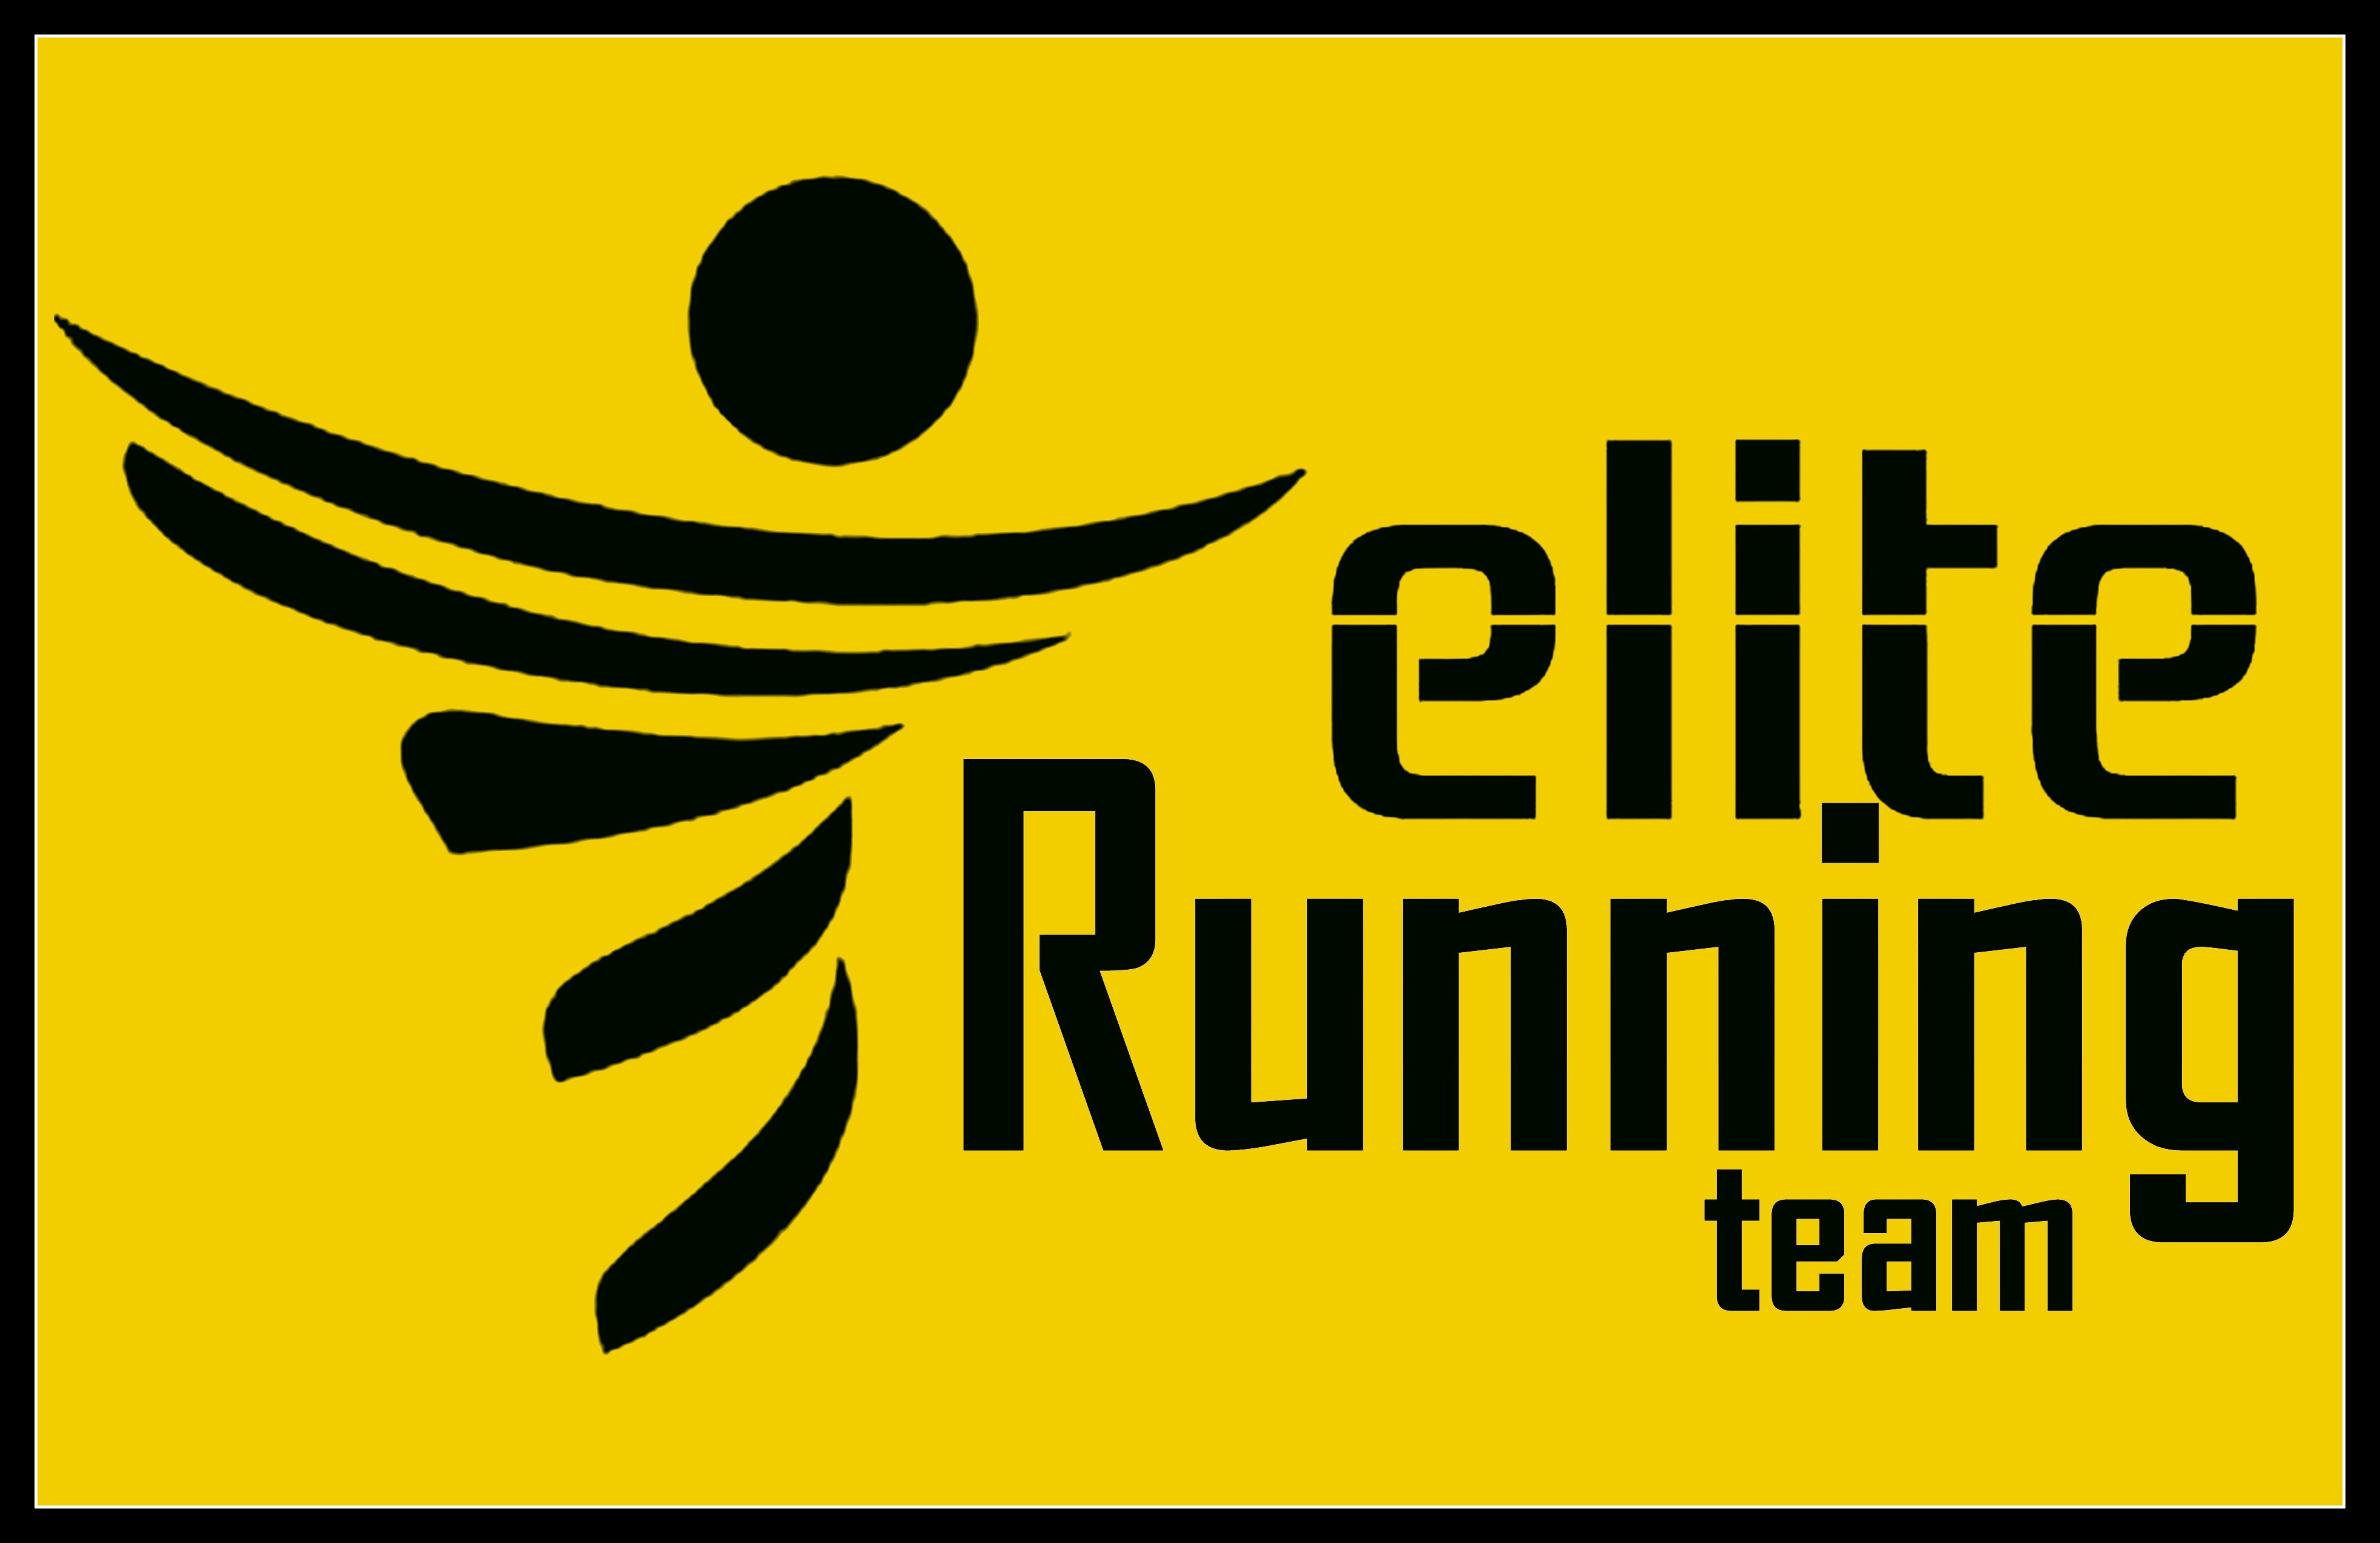 Elite logo atras